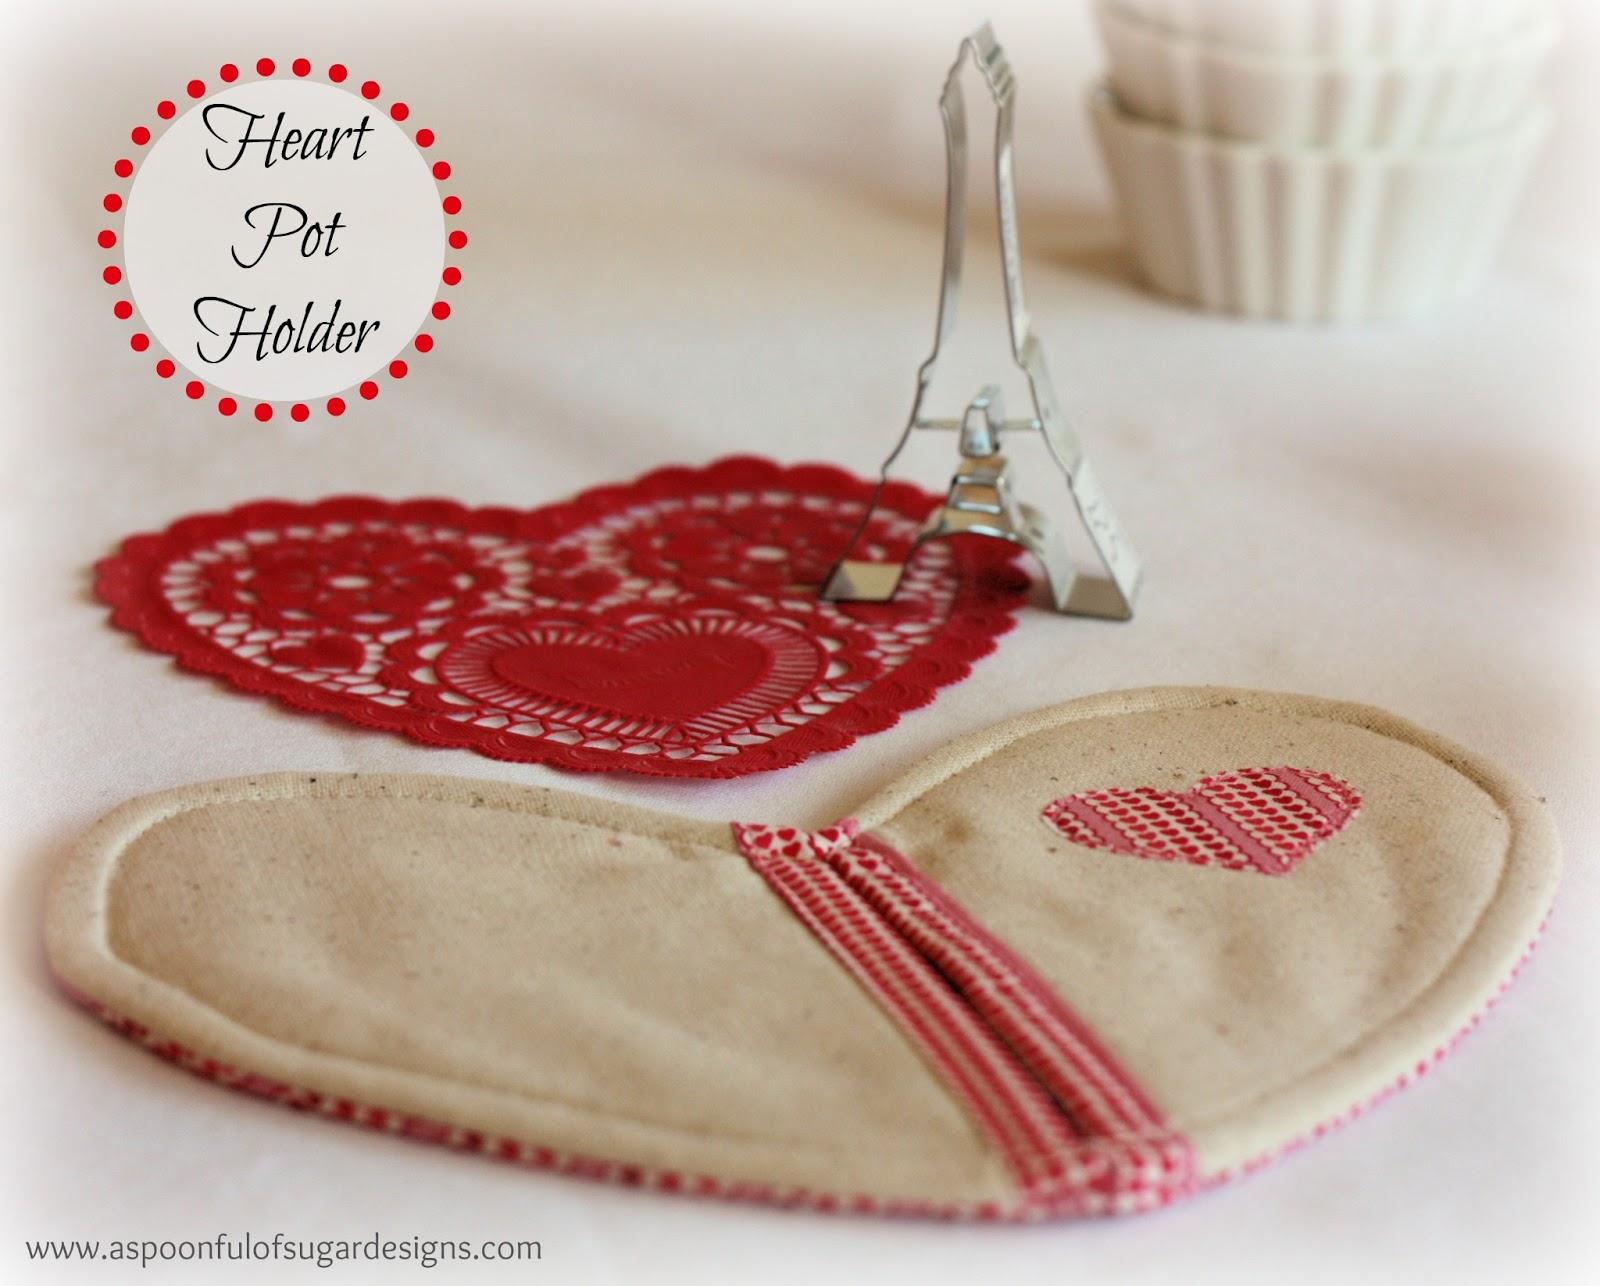 Heart Pot Holder - A Spoonful of Sugar